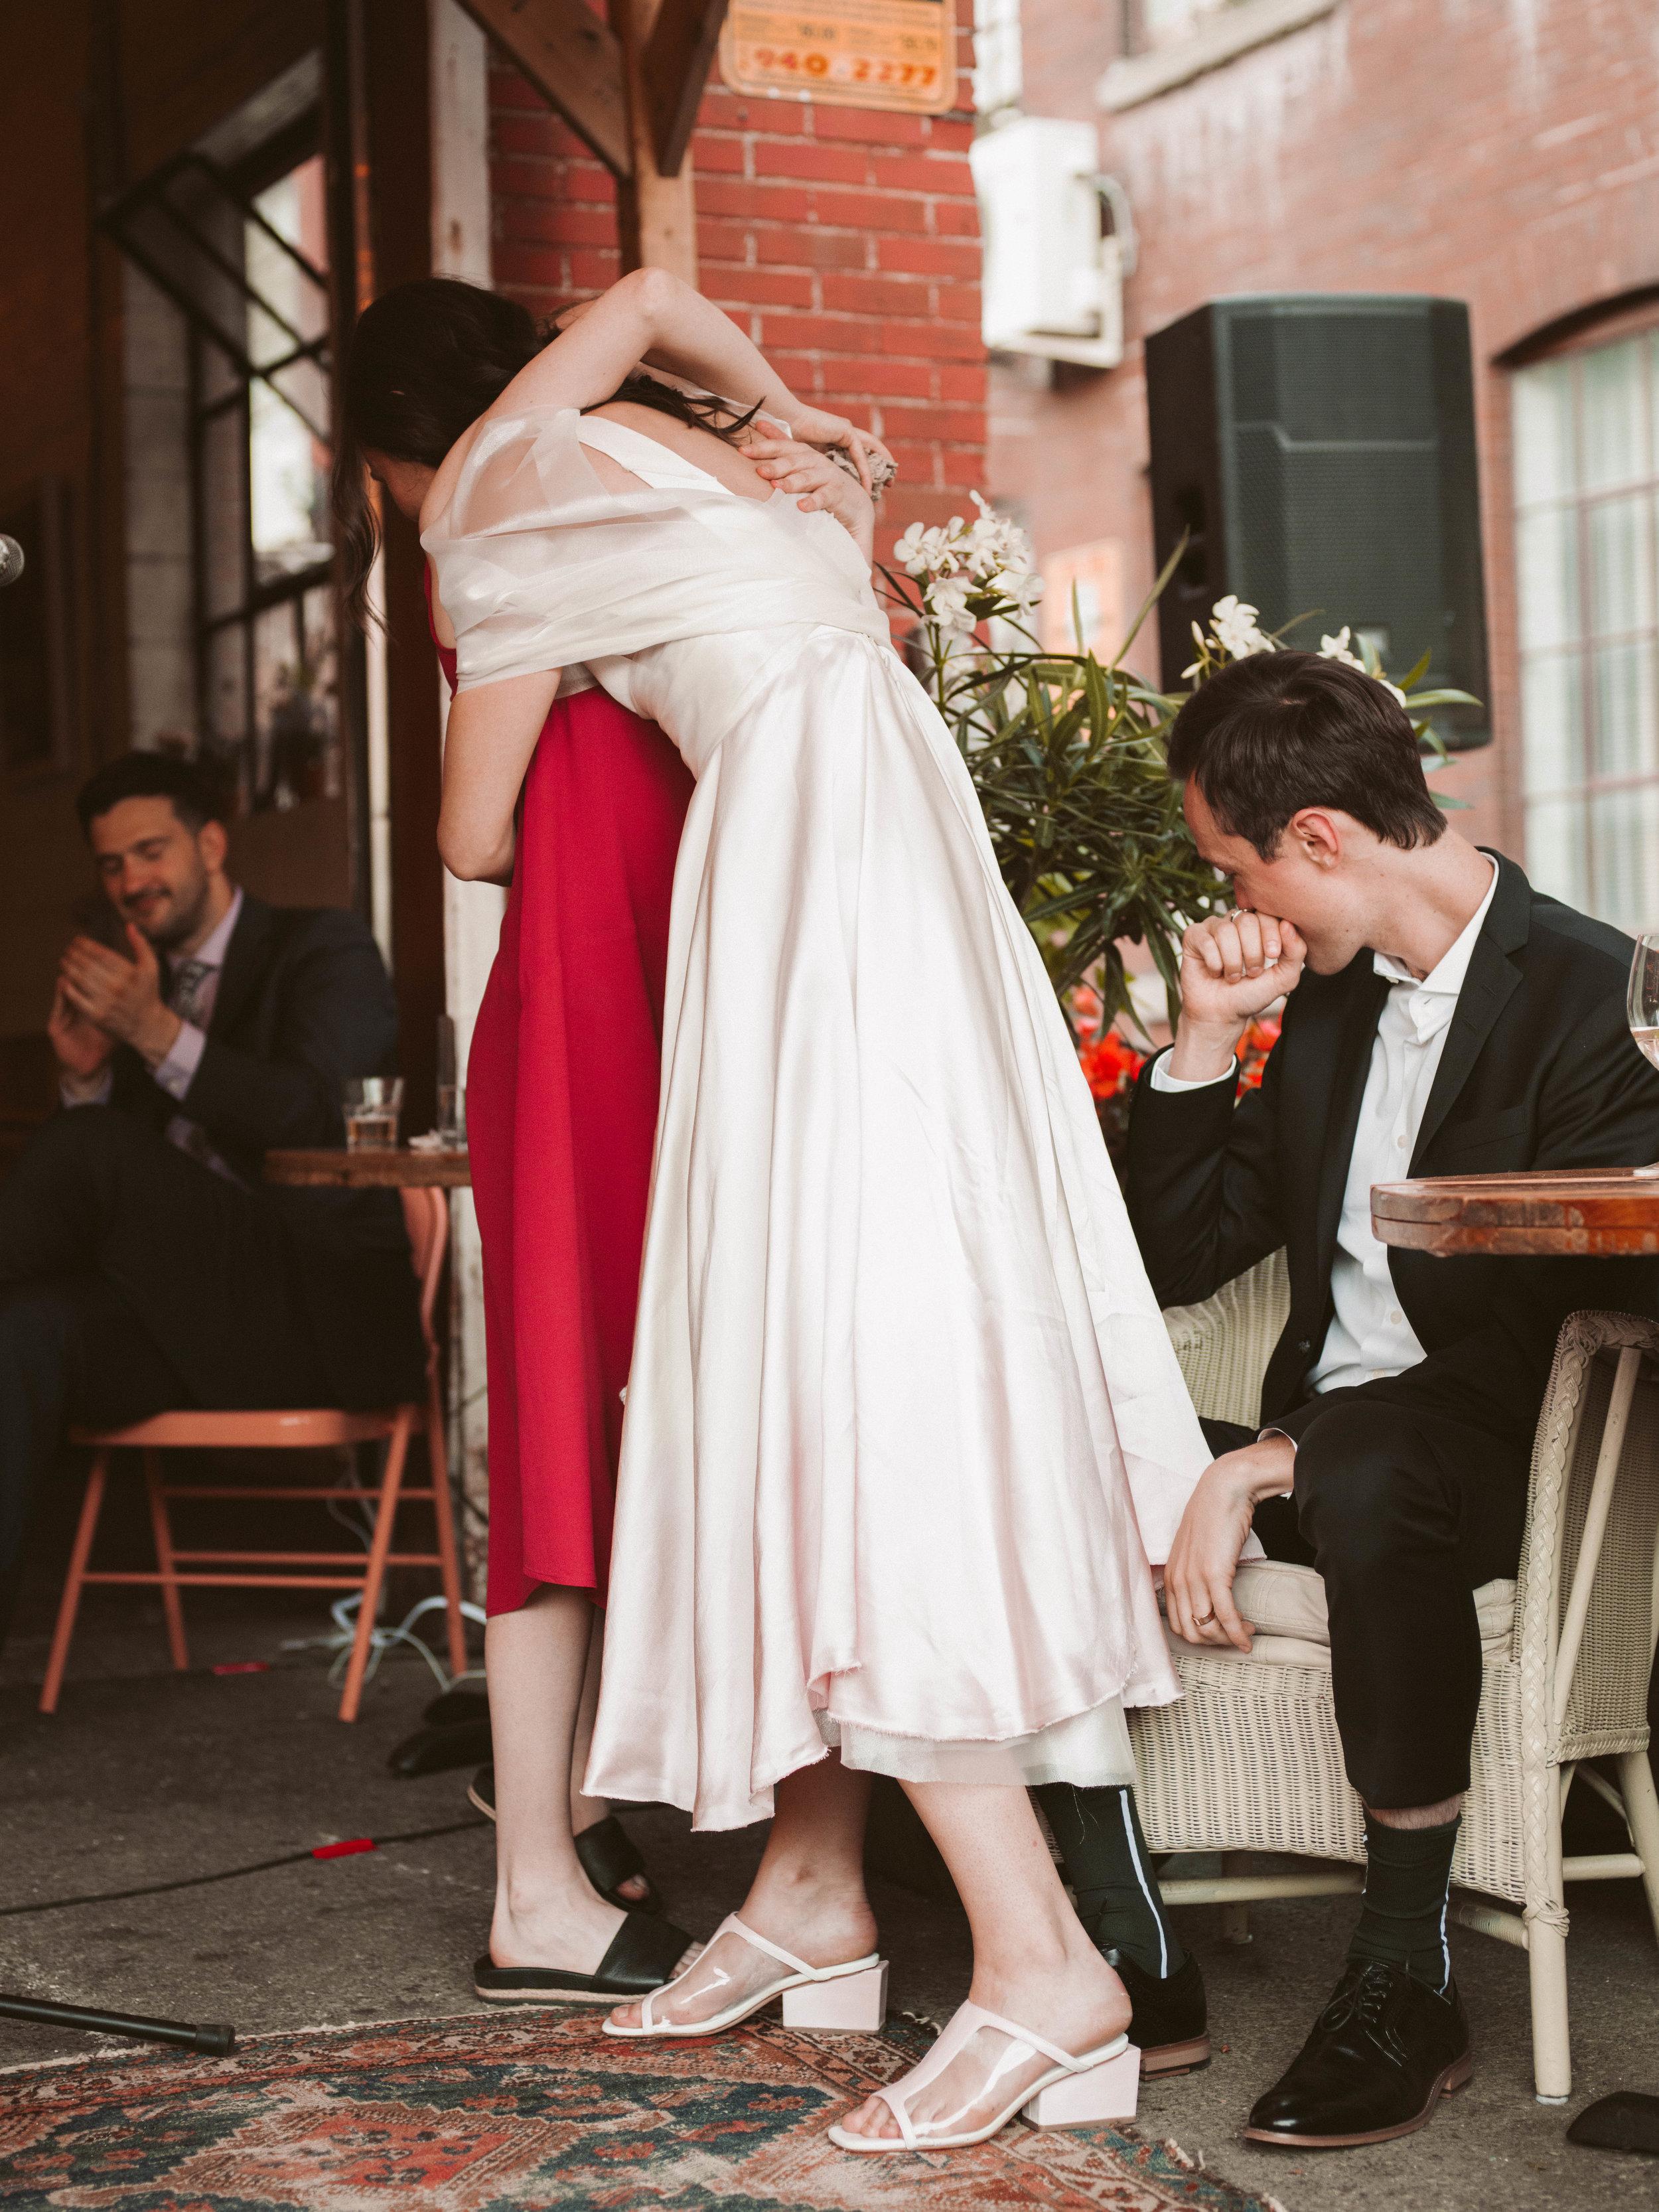 Tim-Darcy_Amy-Fort_Wedding_2019-9975.jpg